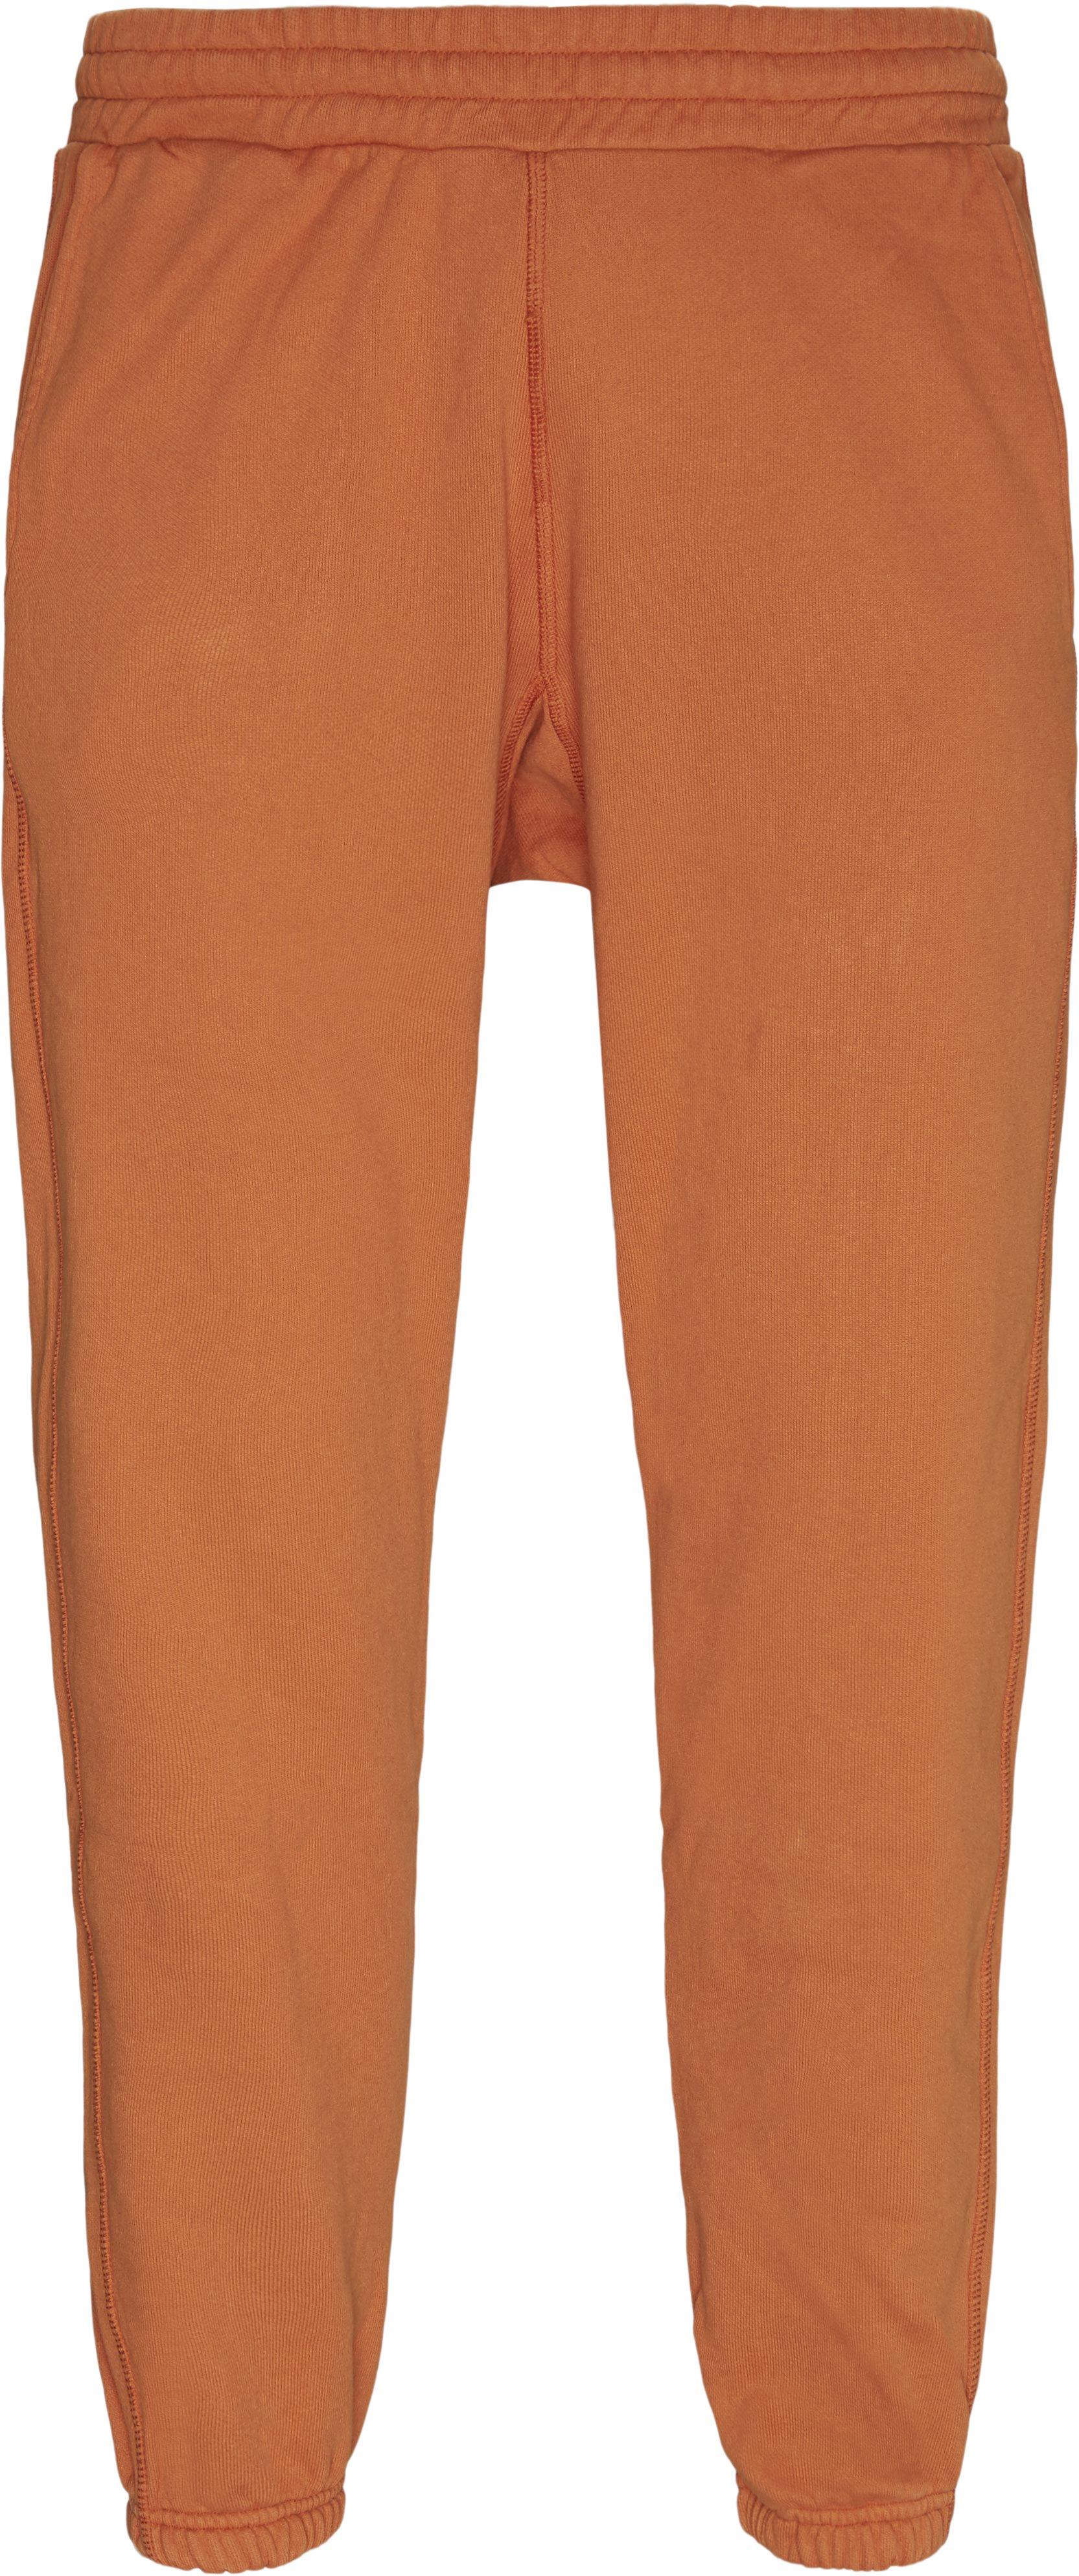 Trousers - Regular - Orange